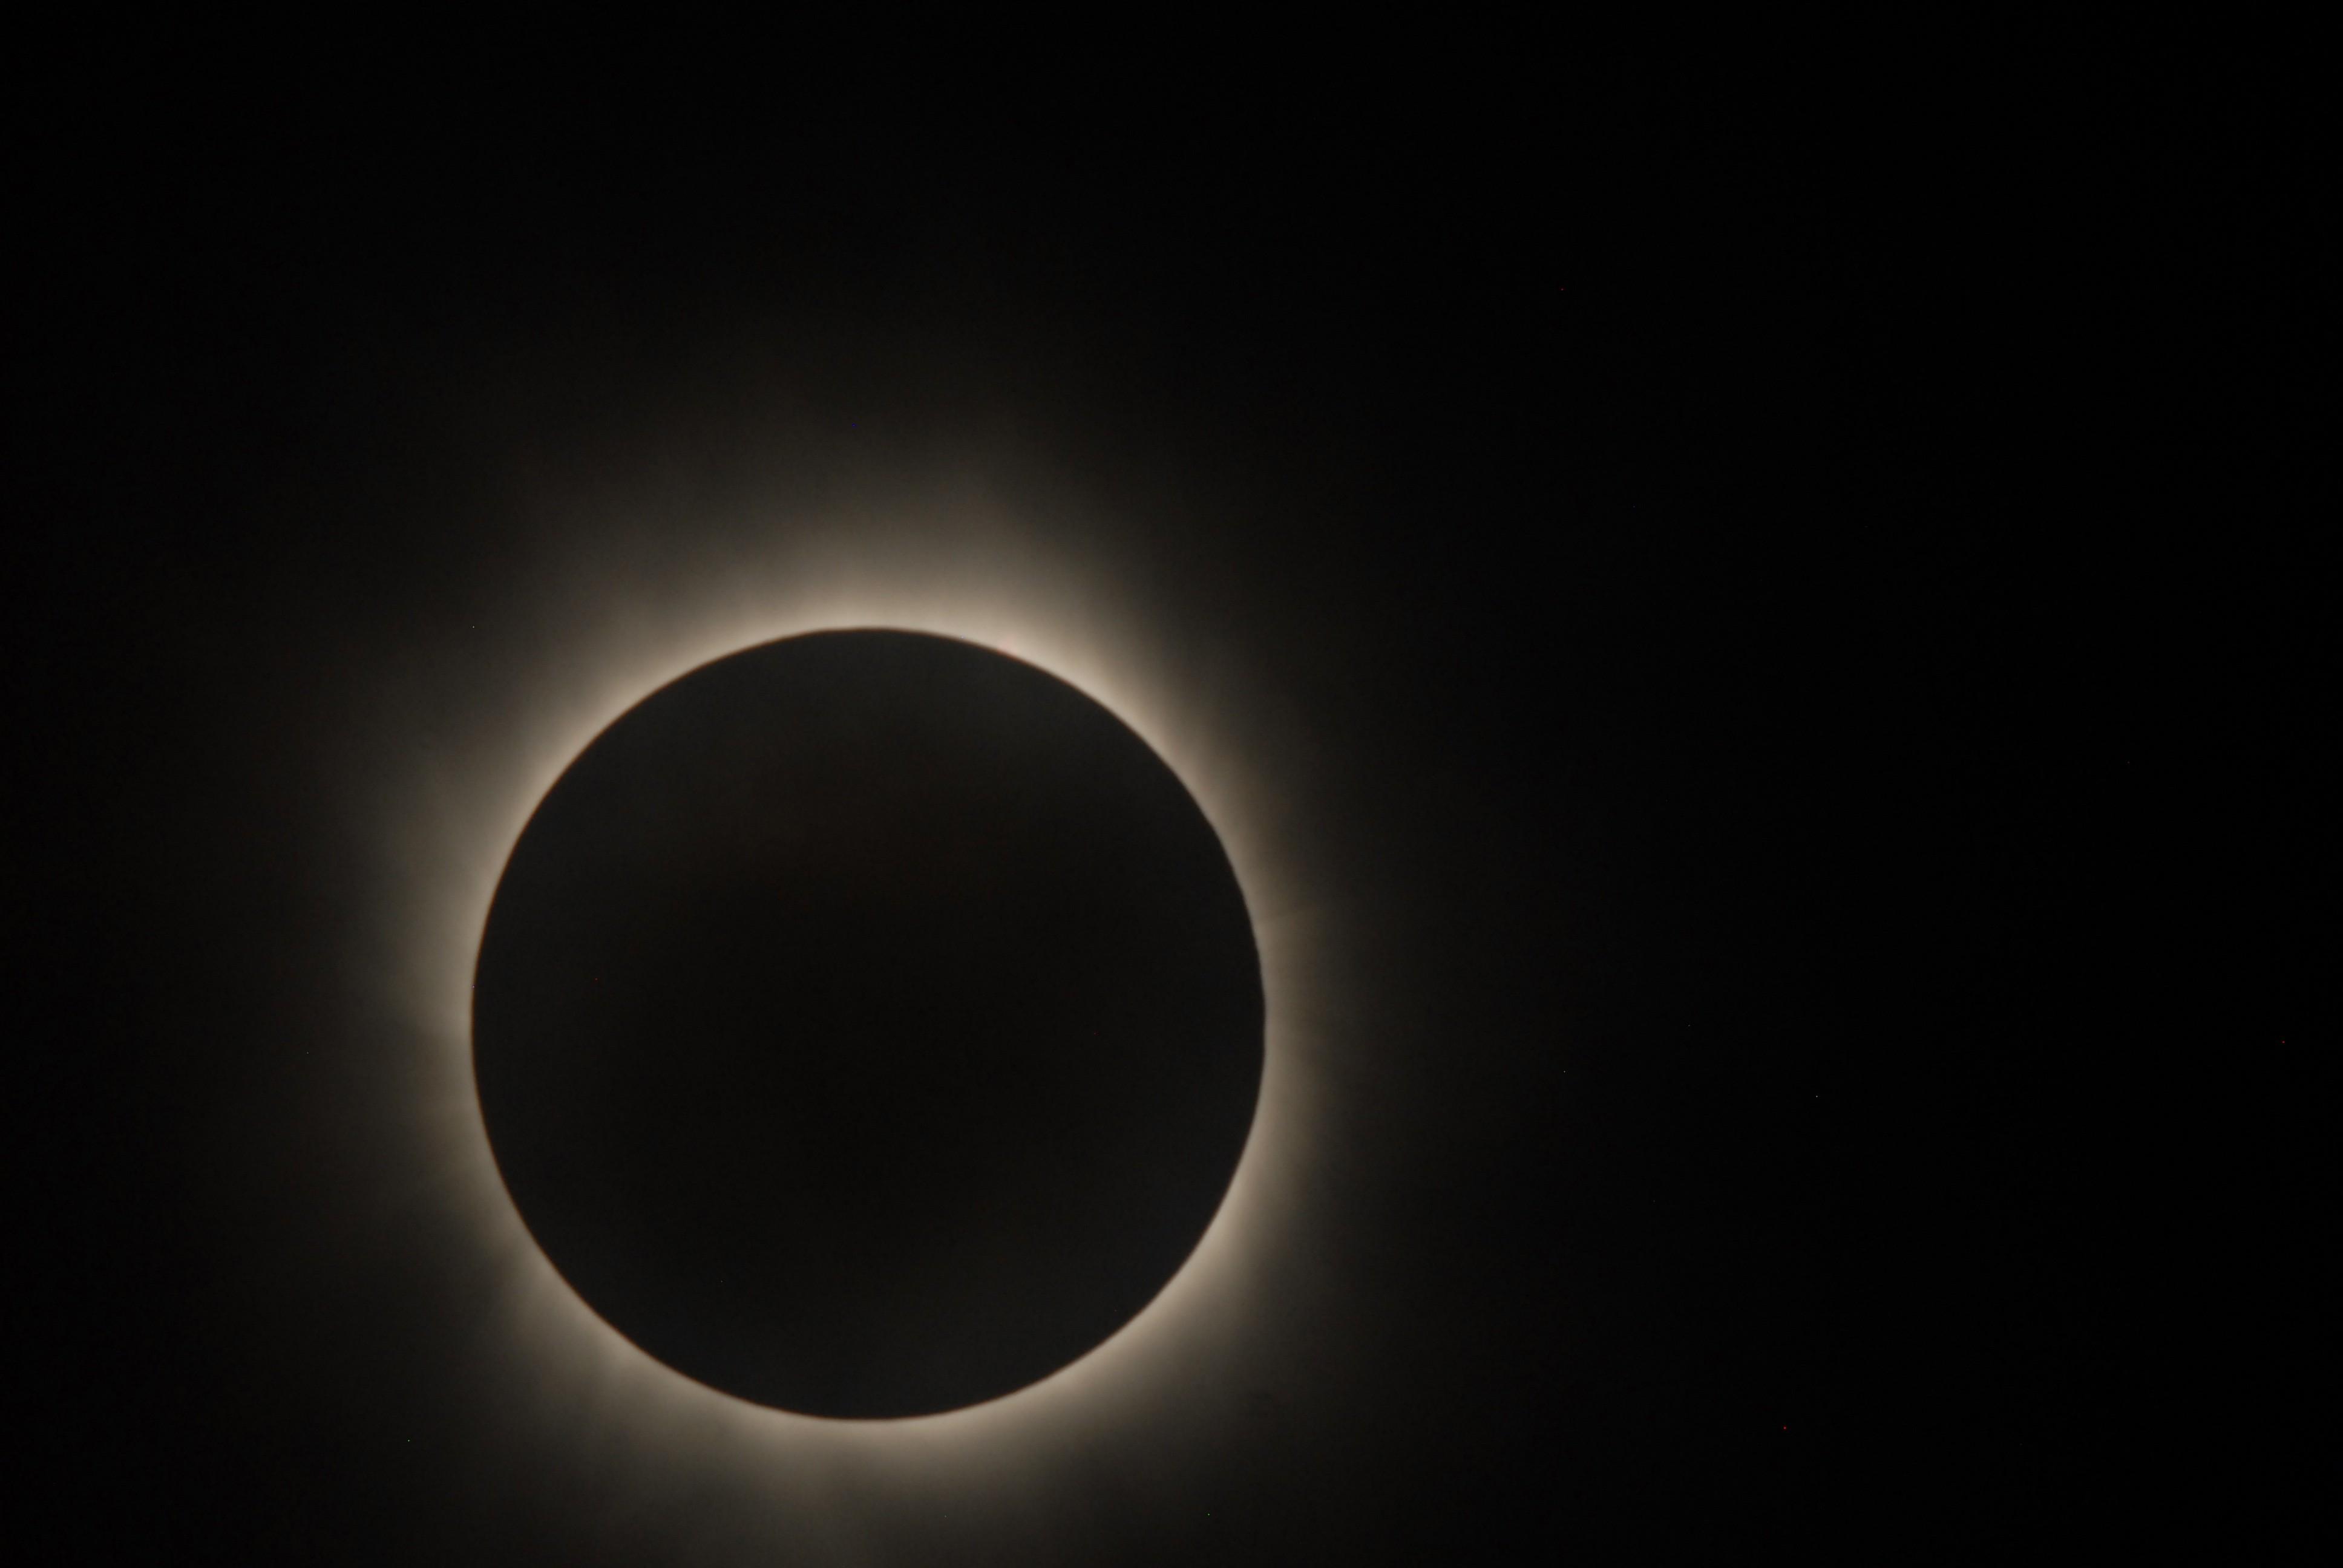 Último eclipse solar foi em novembro de 2013 (Foto: NASA/JAXA)